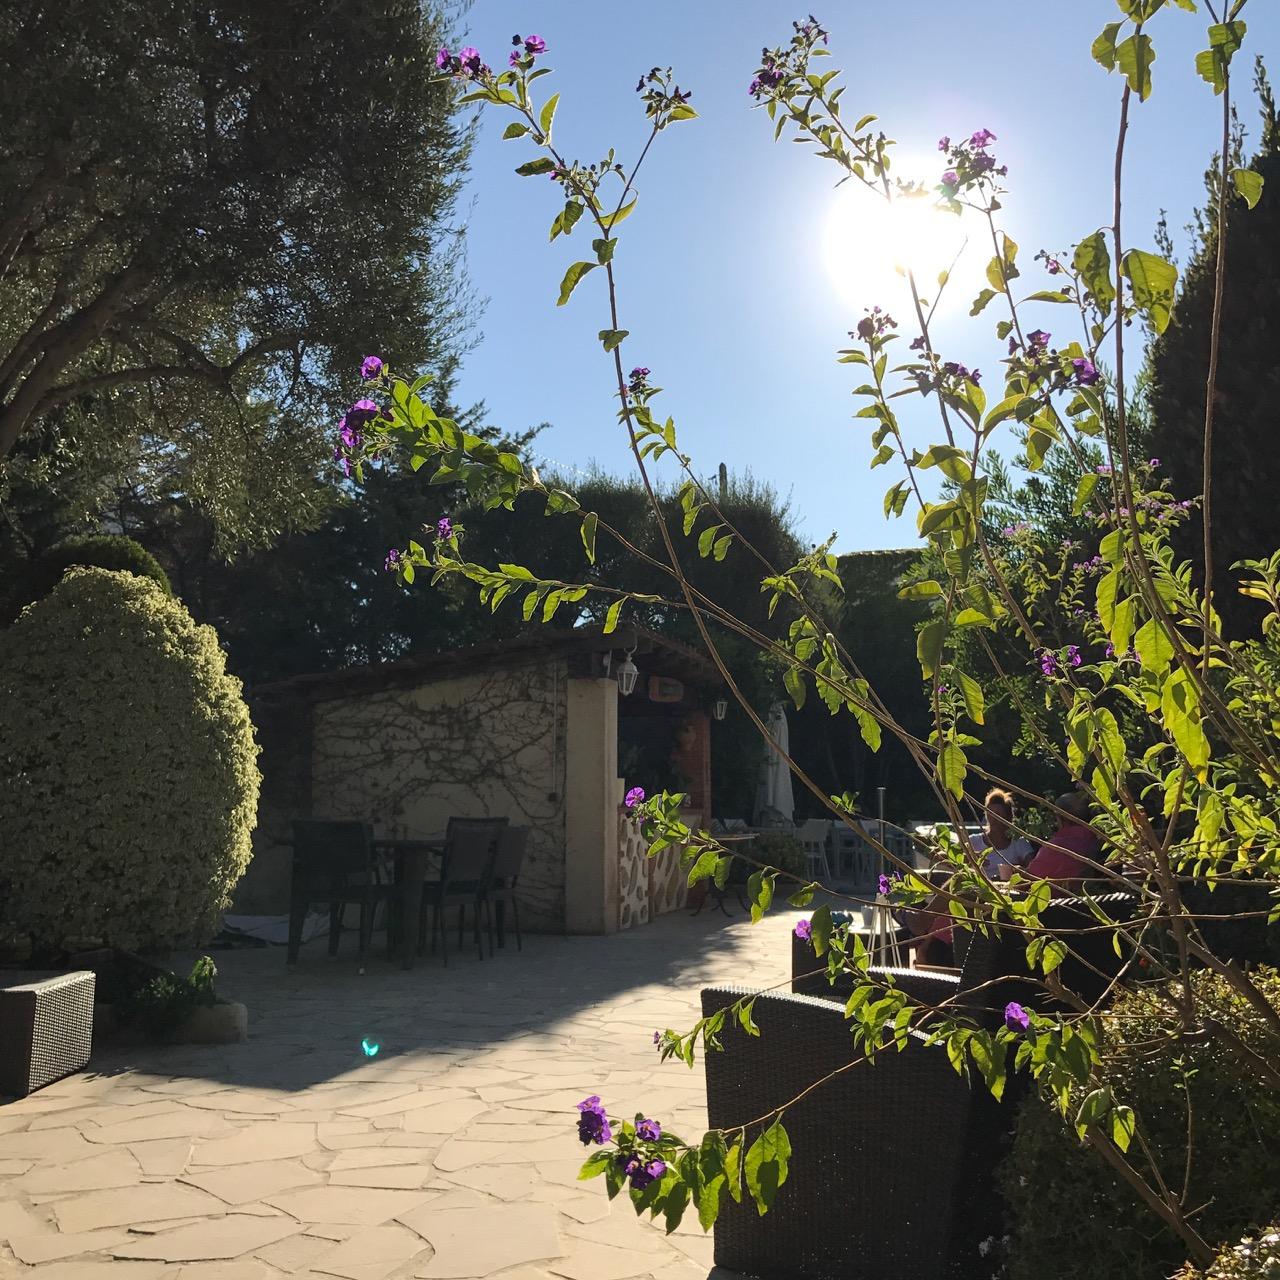 Antibes: Hotel Beau Site